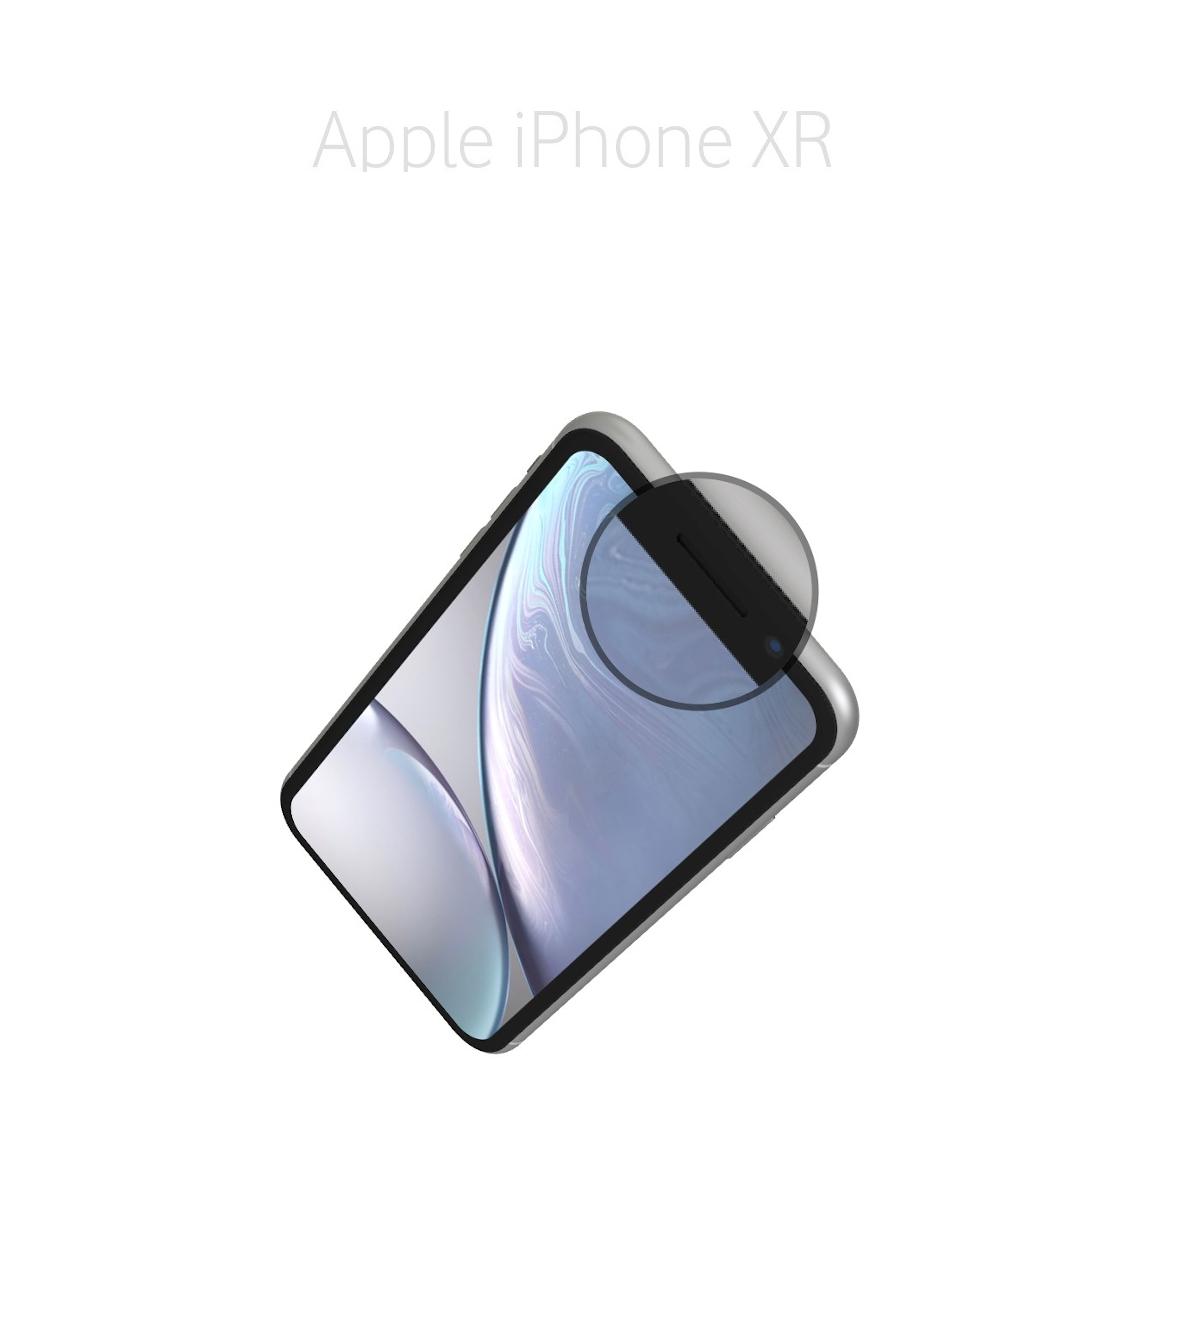 Laga samtalshögtalare iPhone XR